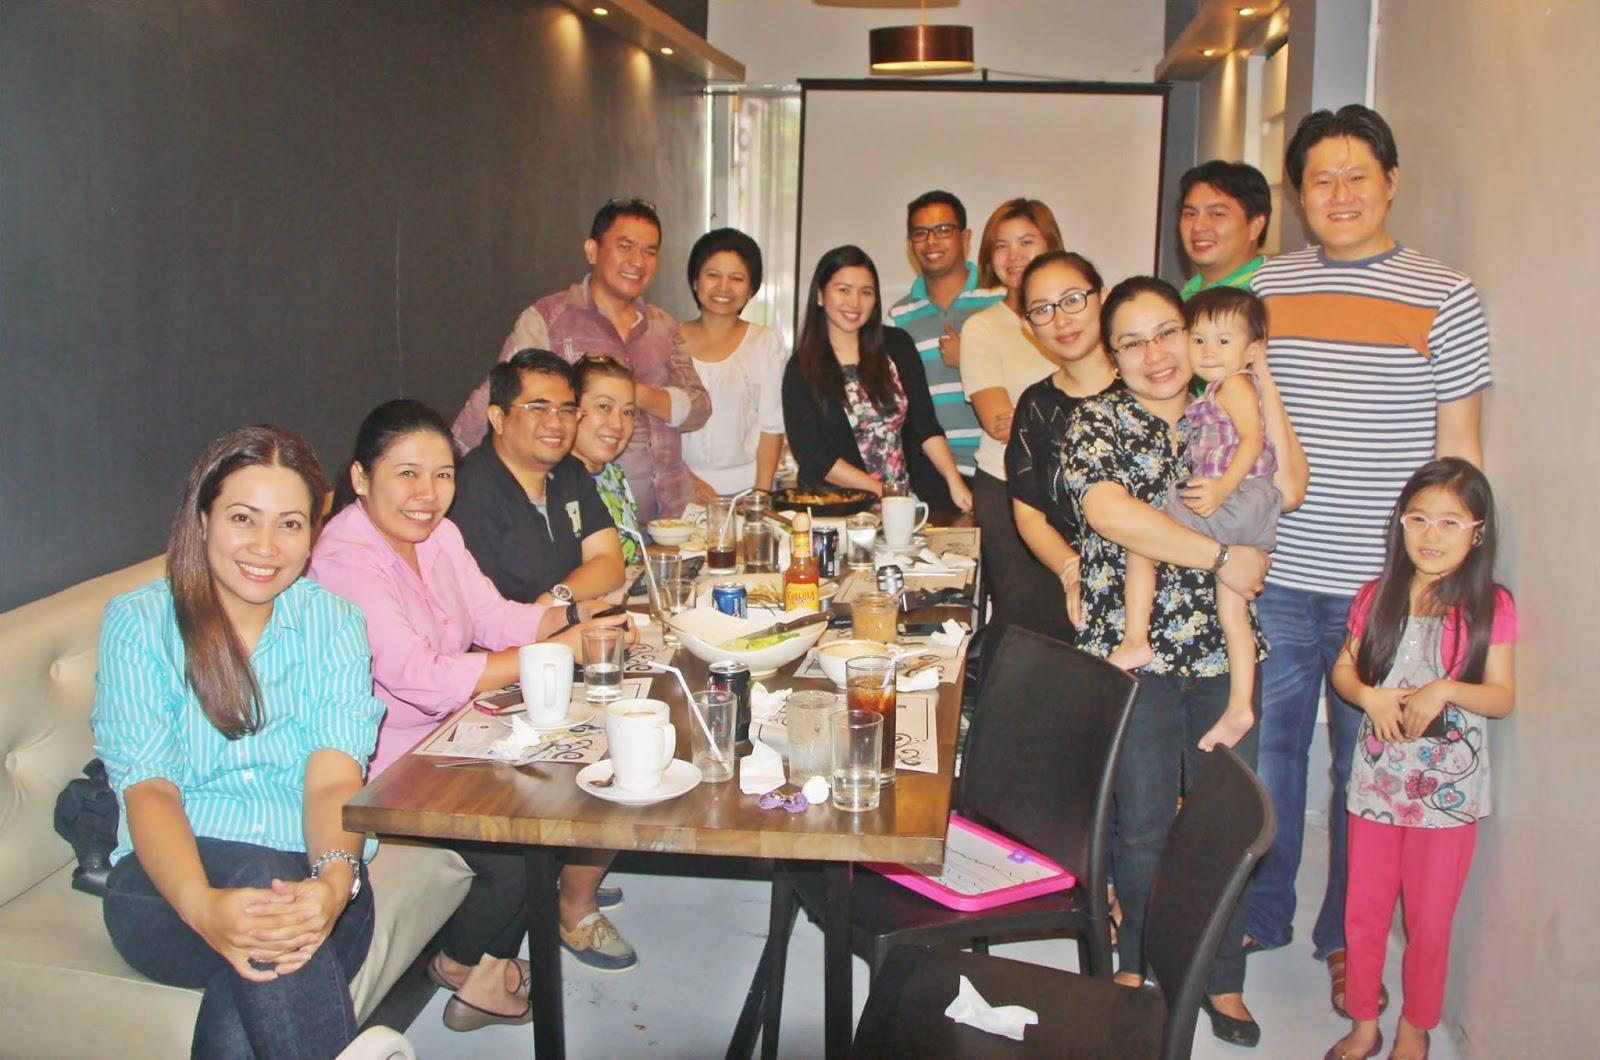 Meganox - health benefits of Meganox - Bacolod bloggers